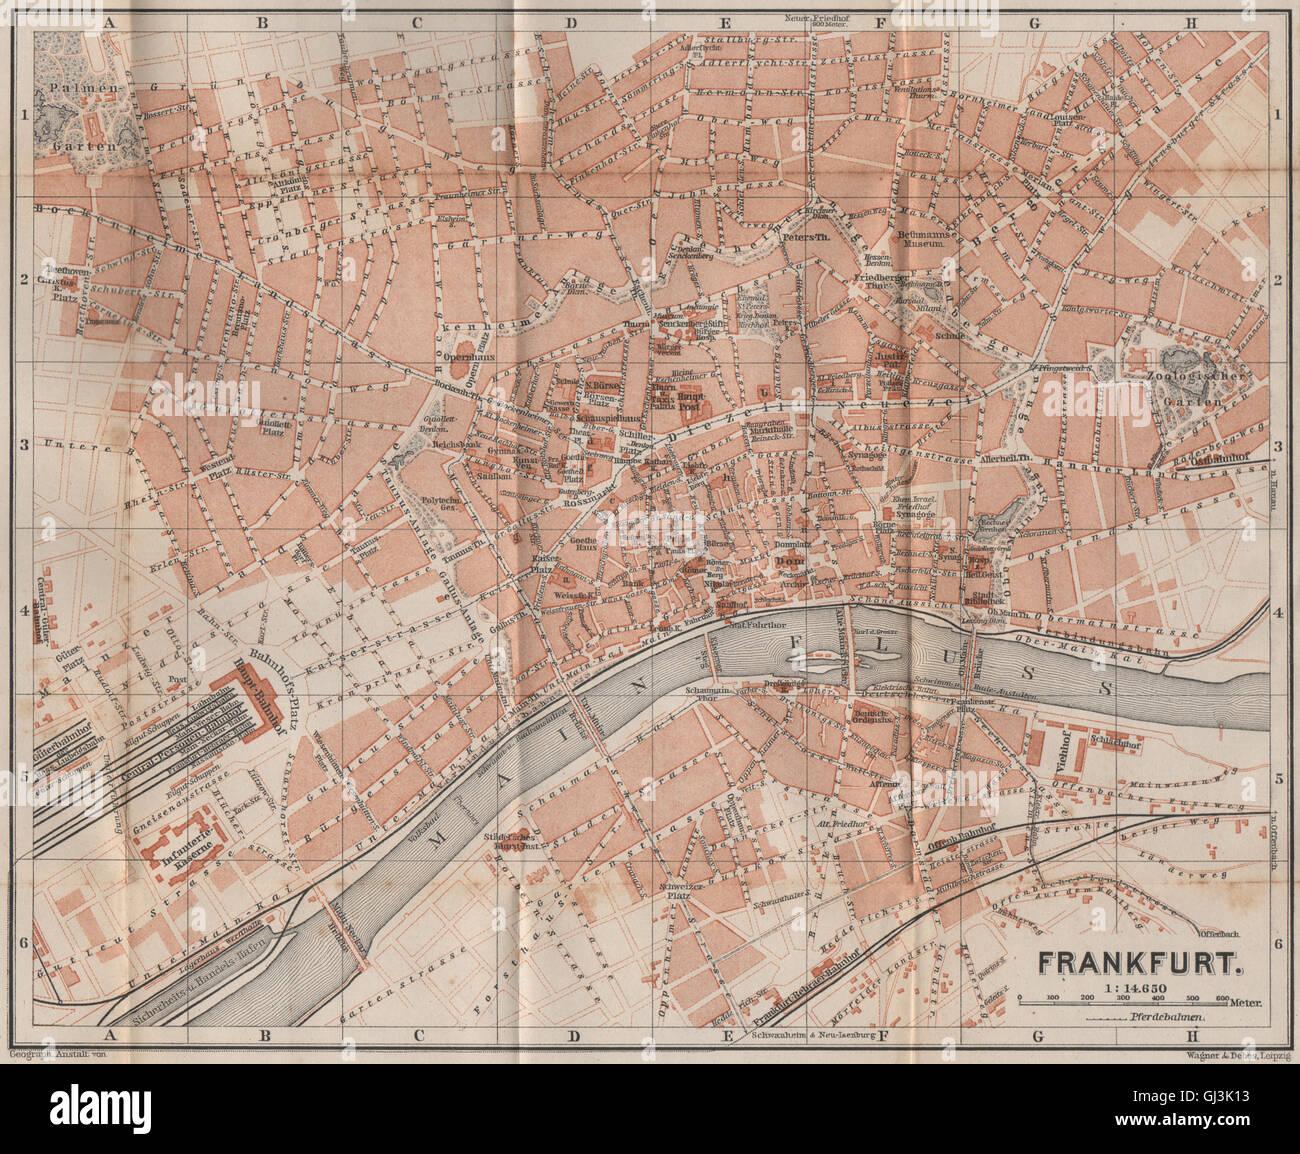 FRANKFURT AM MAIN antique town city stadtplan. Hessen karte Stock ...